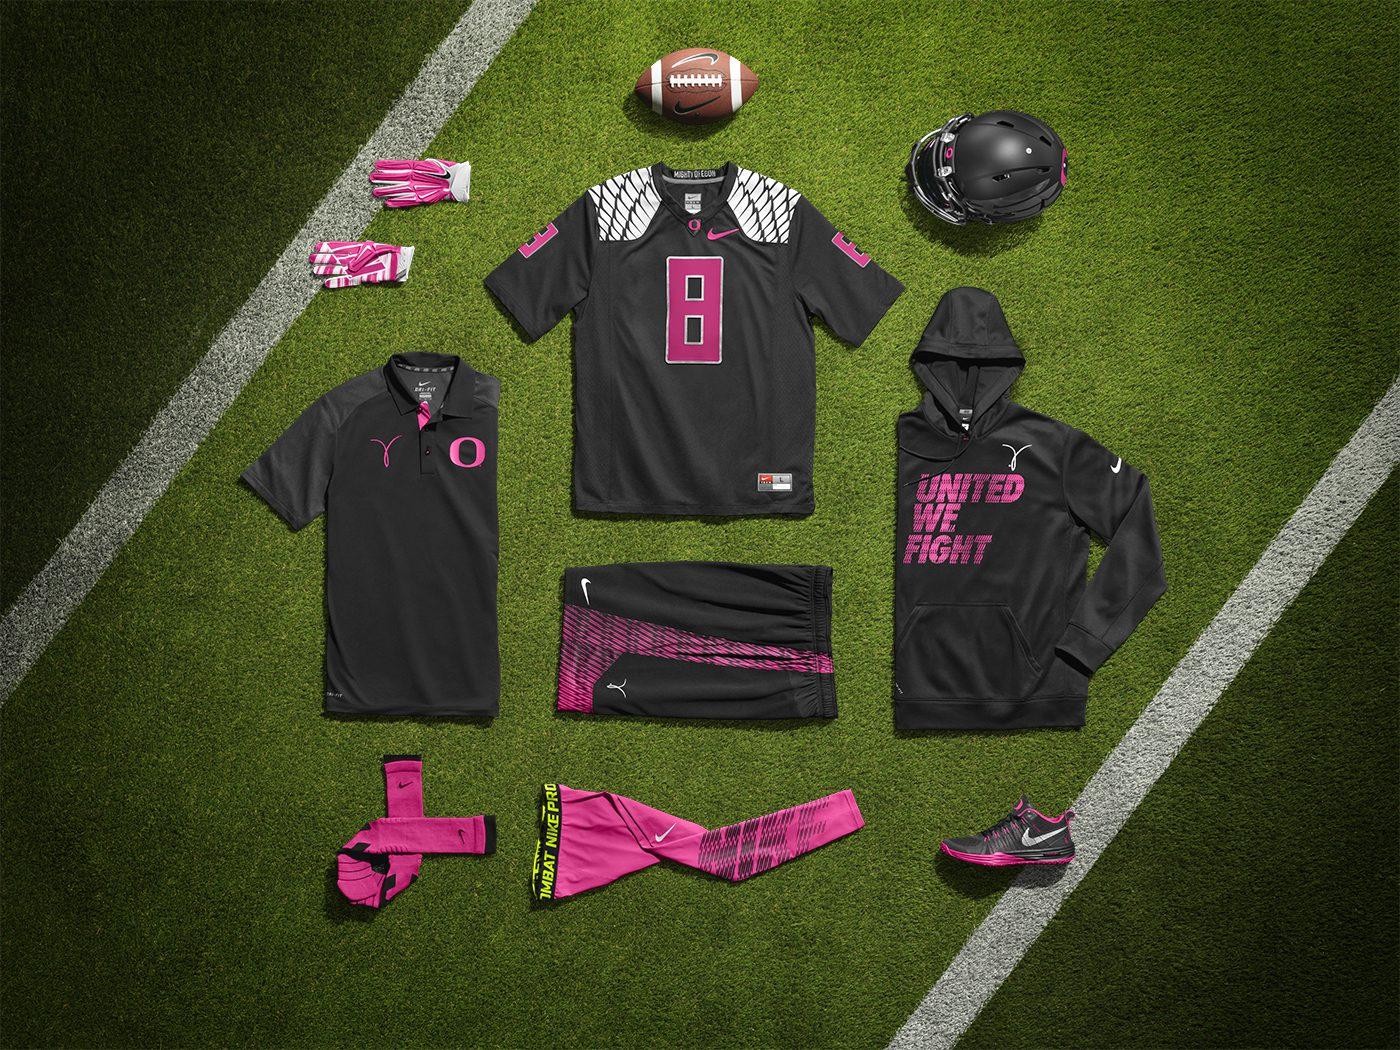 newest 1b01f 1bd7e BMF Gridiron: Nike Pro Combat Oregon Ducks Kay Yow Uniform ...